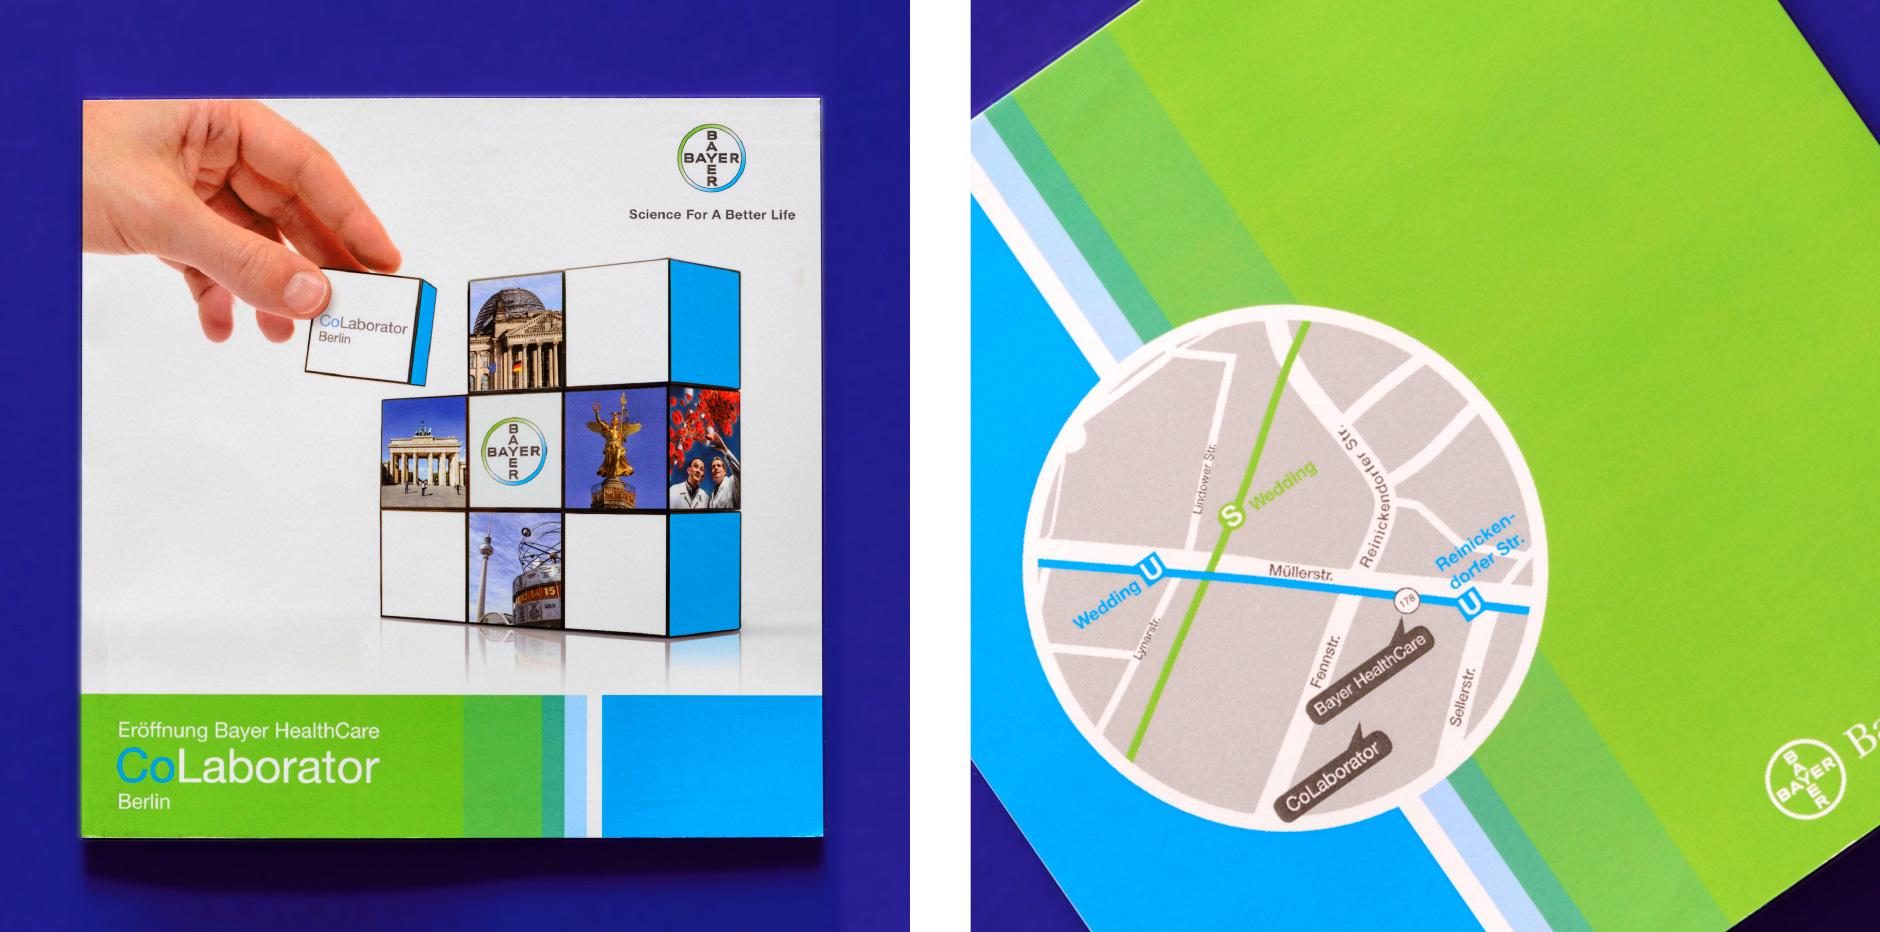 Bayer Healthcare - Eröffnung CoLaborator Berlin